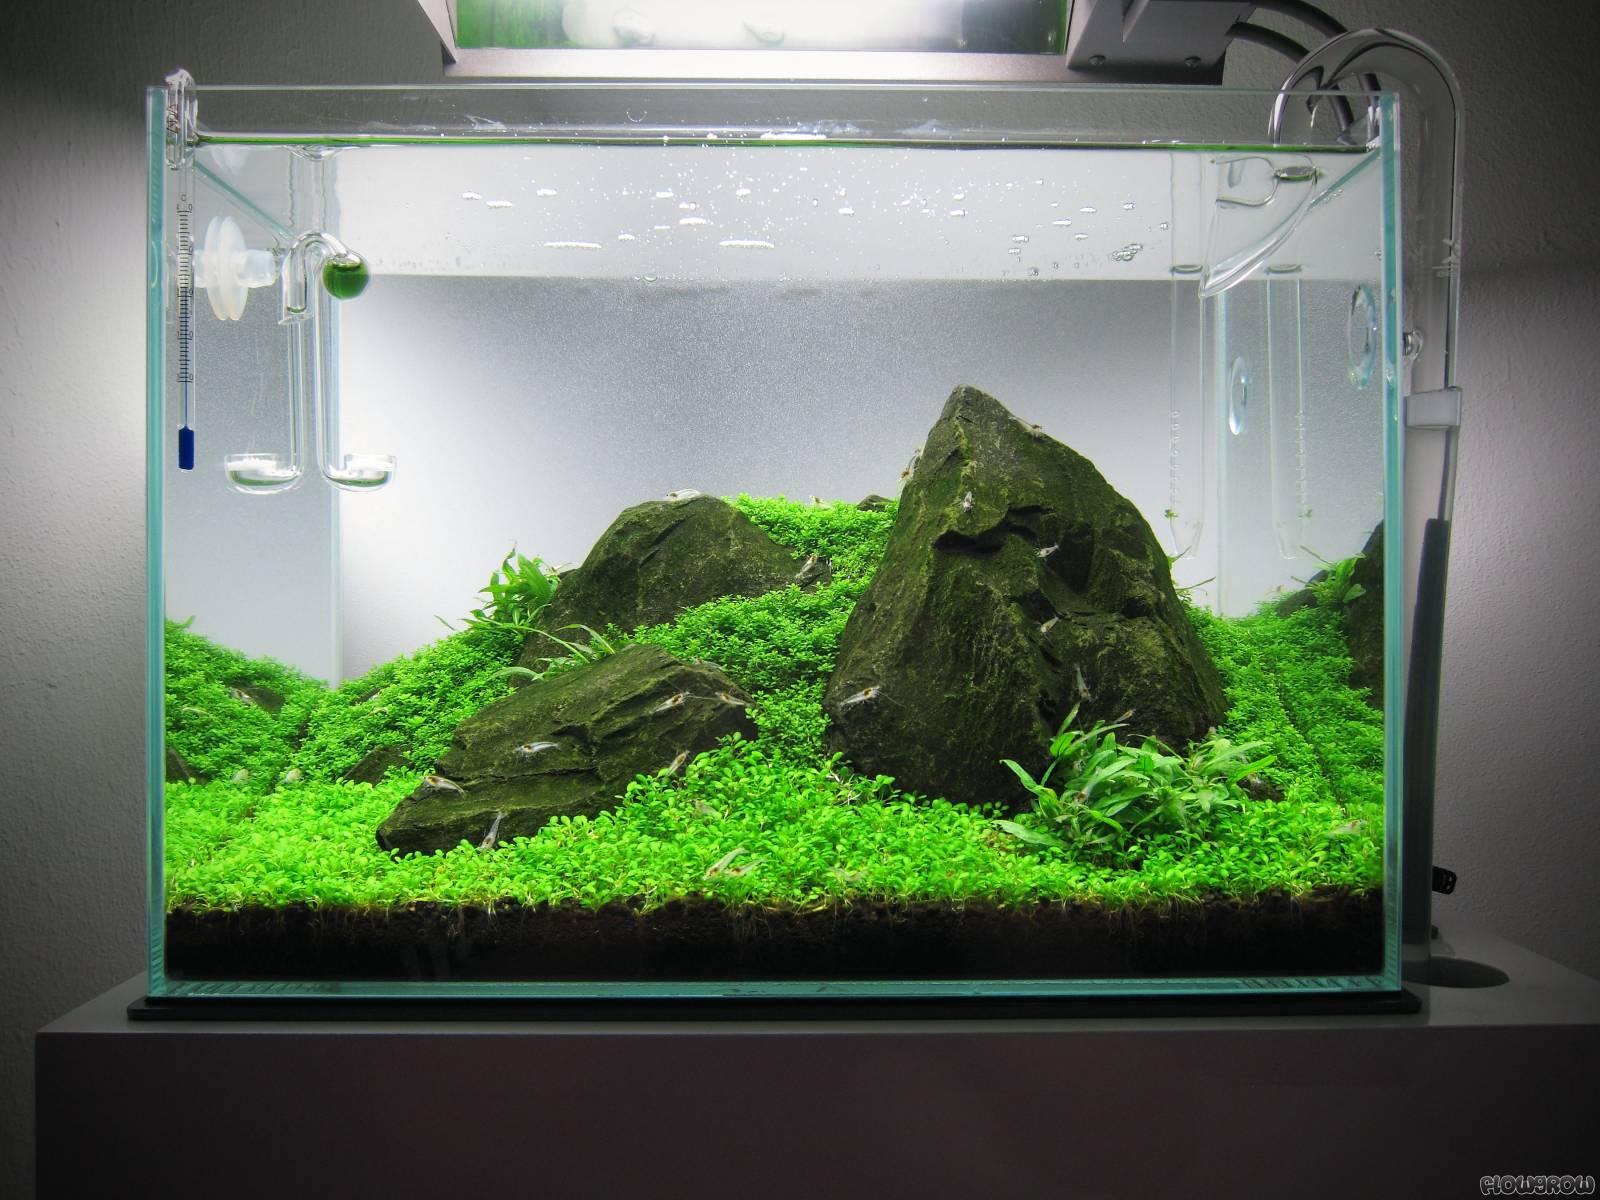 Compact Kitchen Layout Iwagumi Im Glasgarten Mini M Flowgrow Aquascape Aquarium